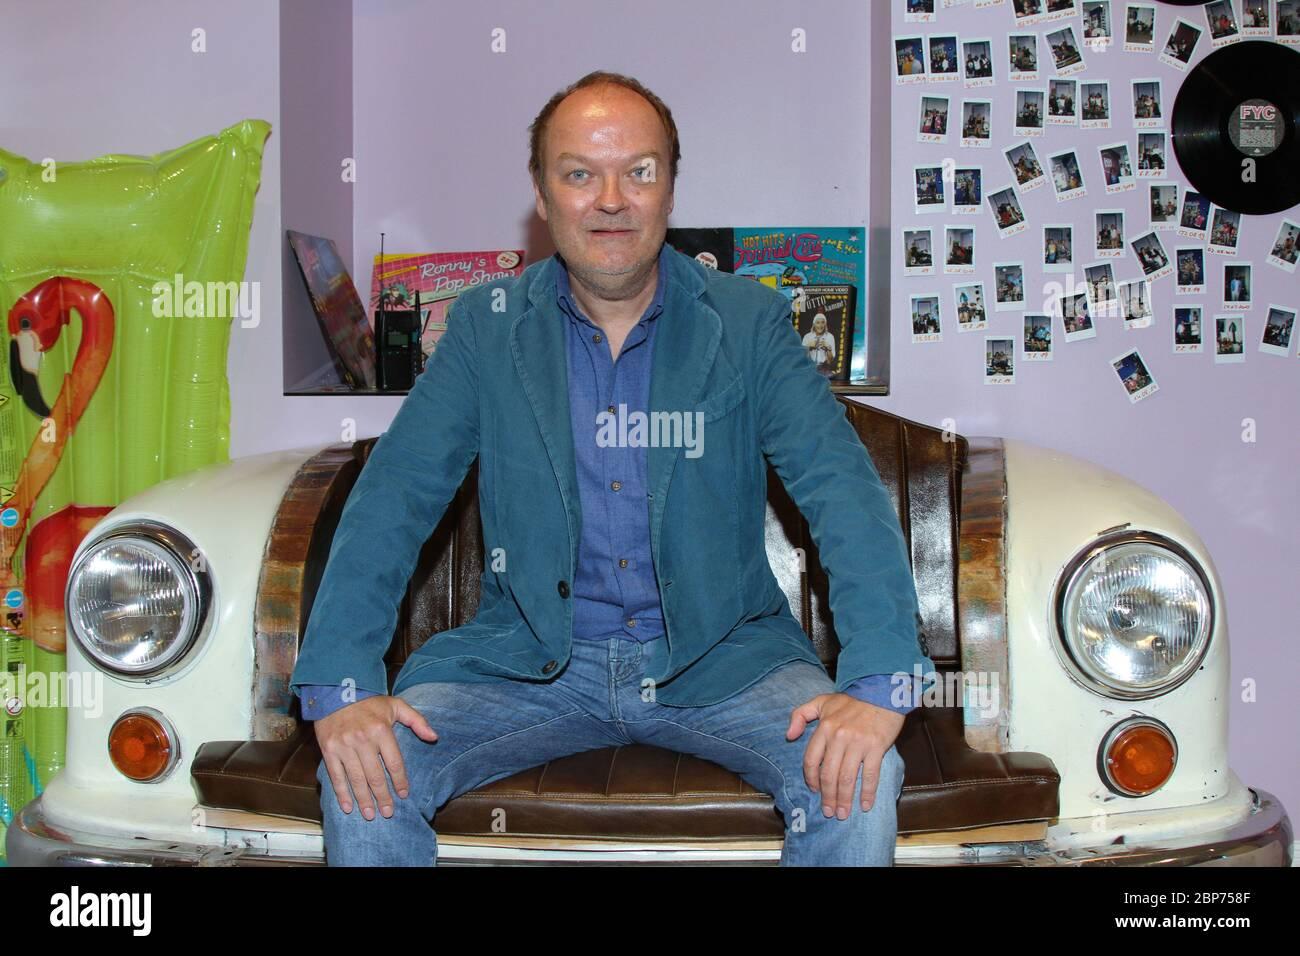 Jens Wawrzeck, Fototermin im Hamburg Zwei 80er Cafe à Ottensen, Hambourg, 15.08.2019 Banque D'Images